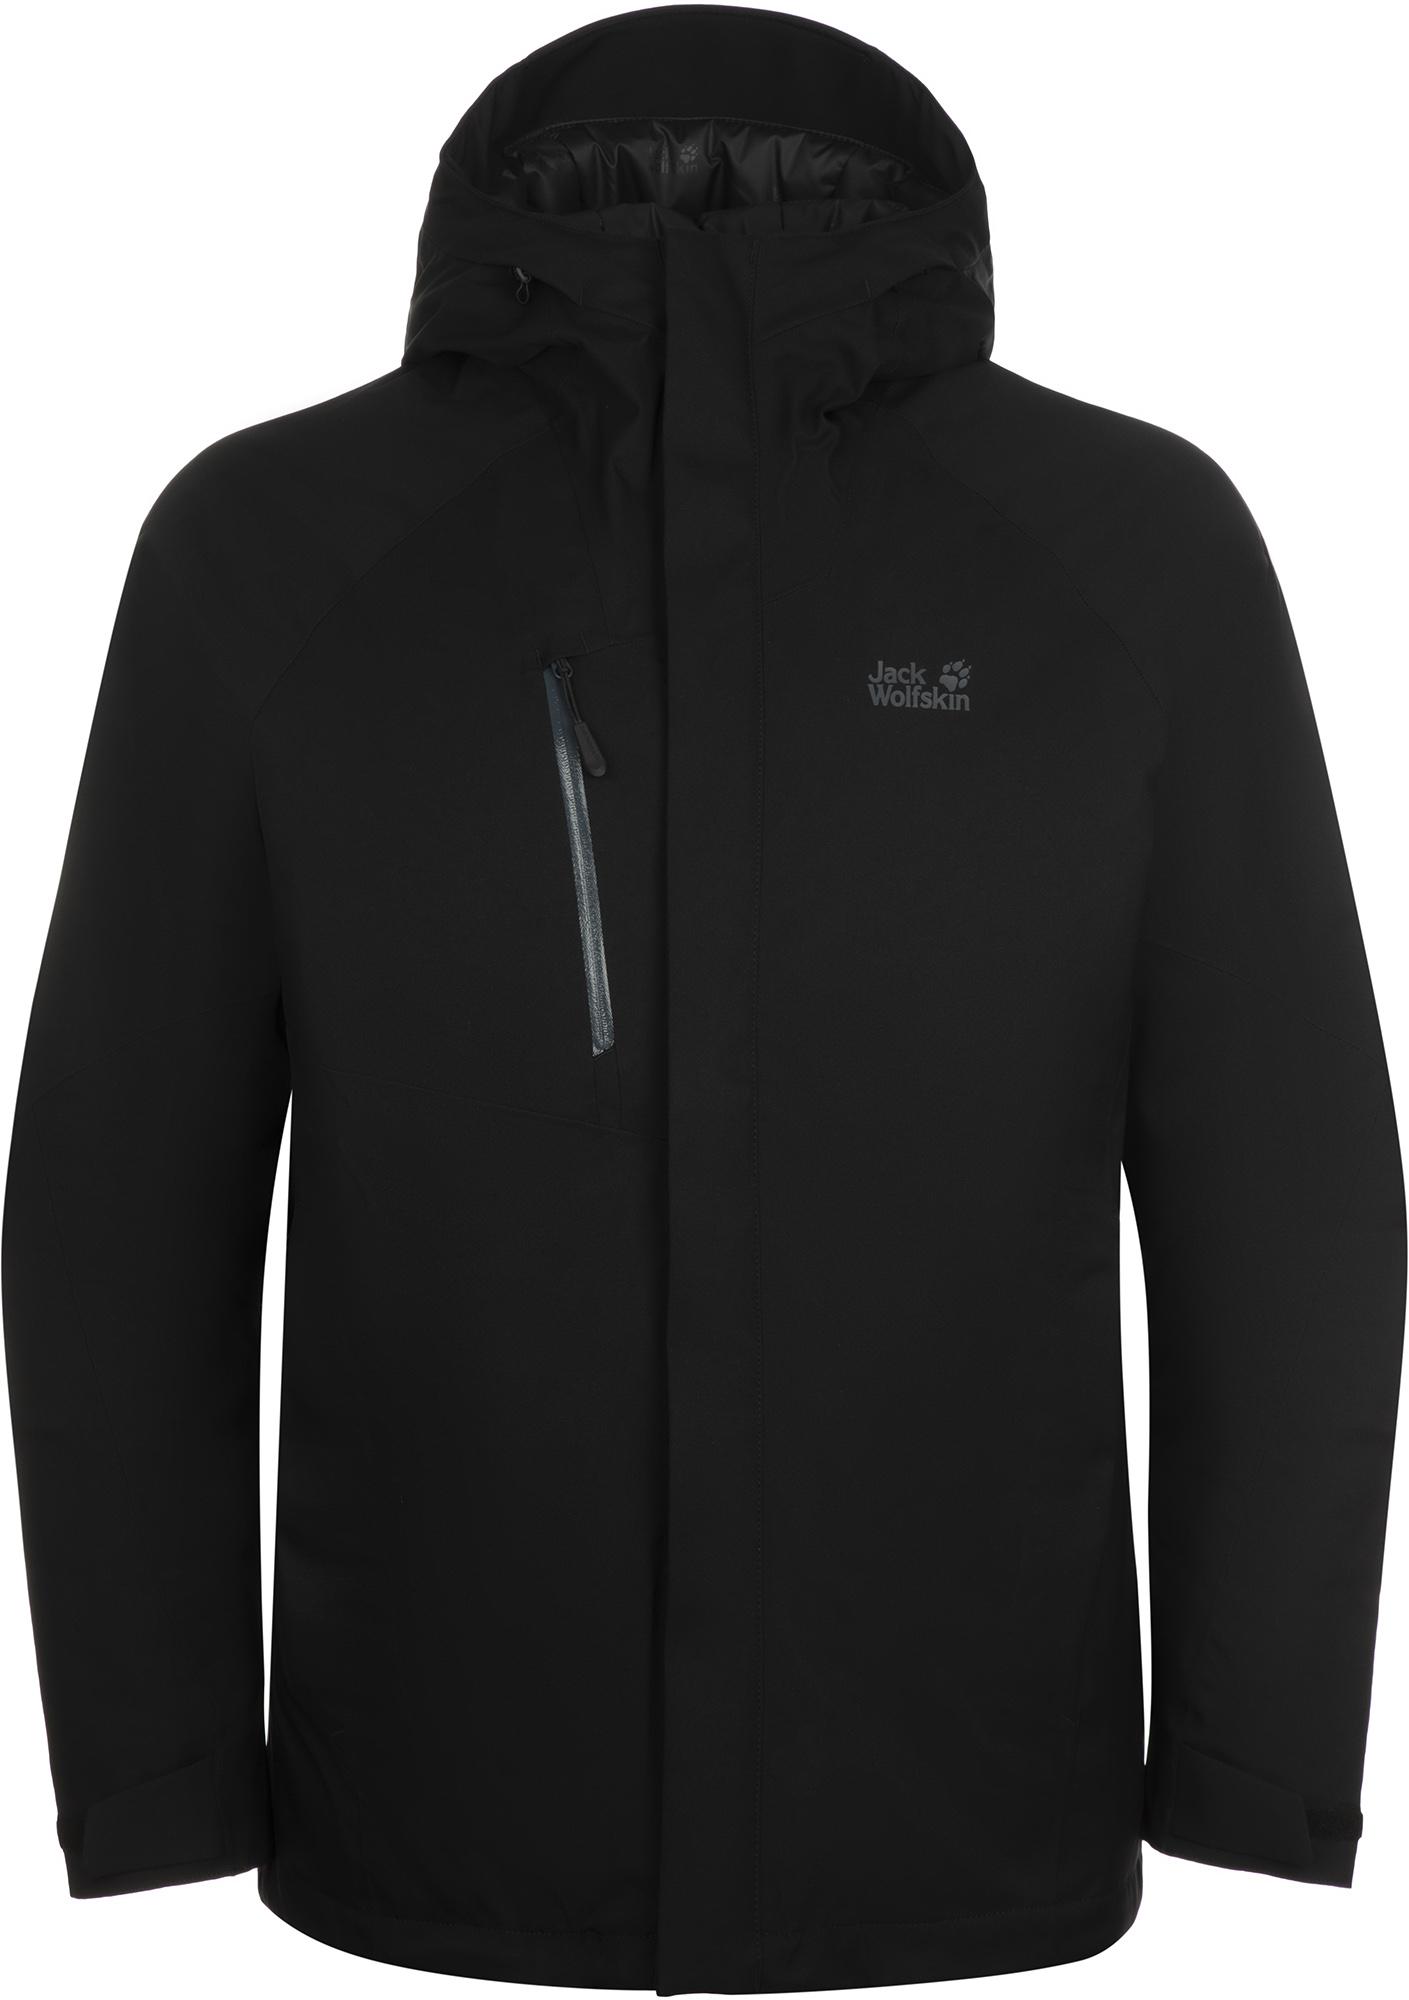 JACK WOLFSKIN Куртка утепленная мужская Jack Wolfskin Troposphere, размер 44